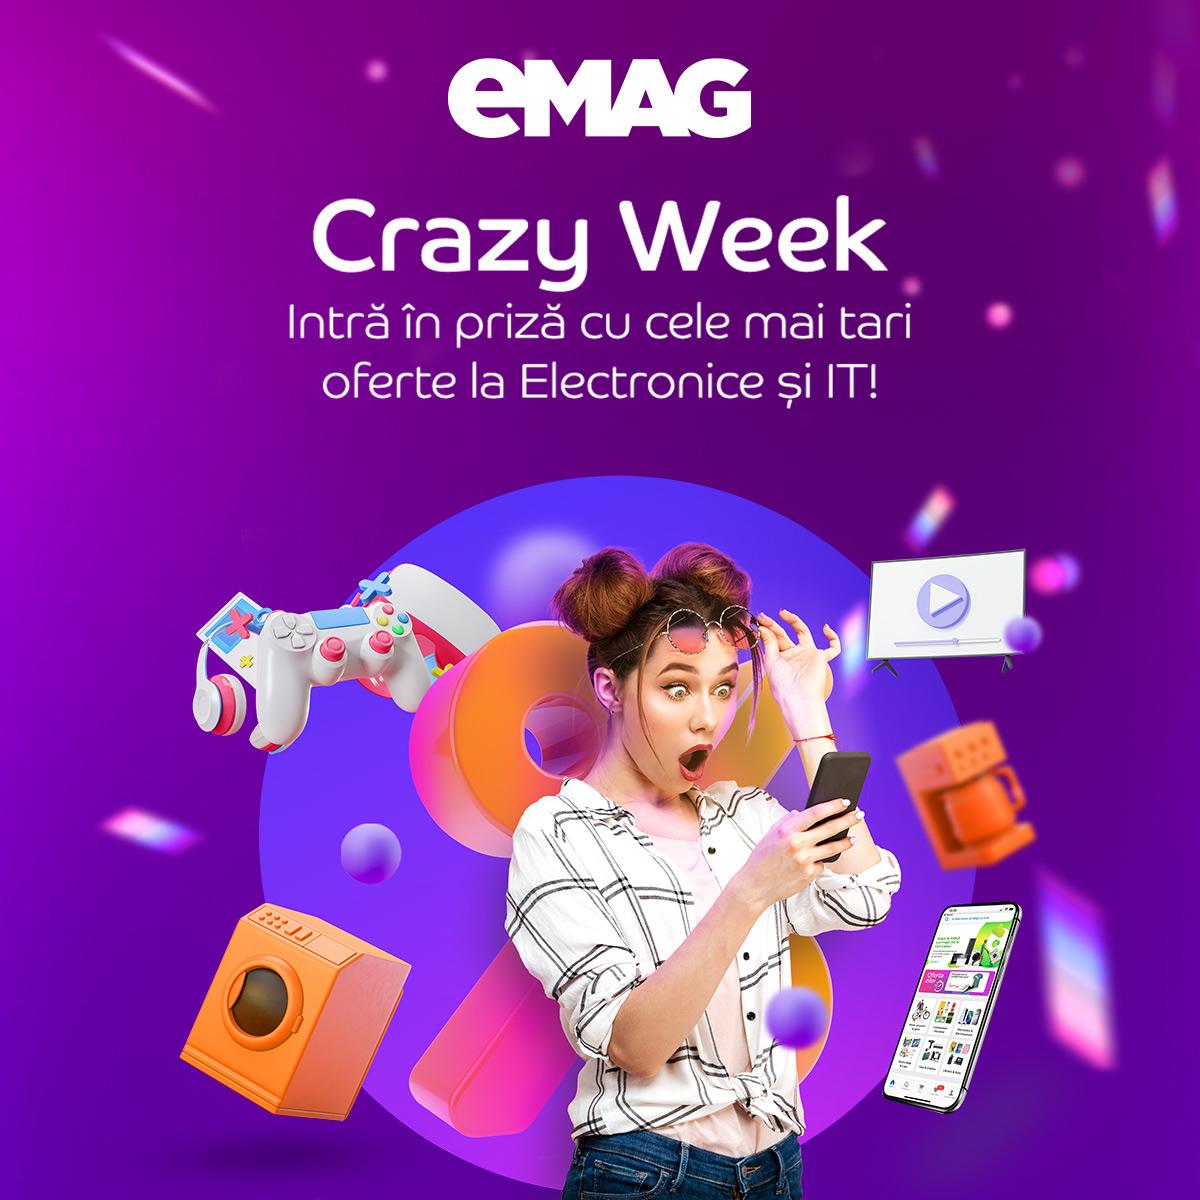 eMAG - Crazy Week